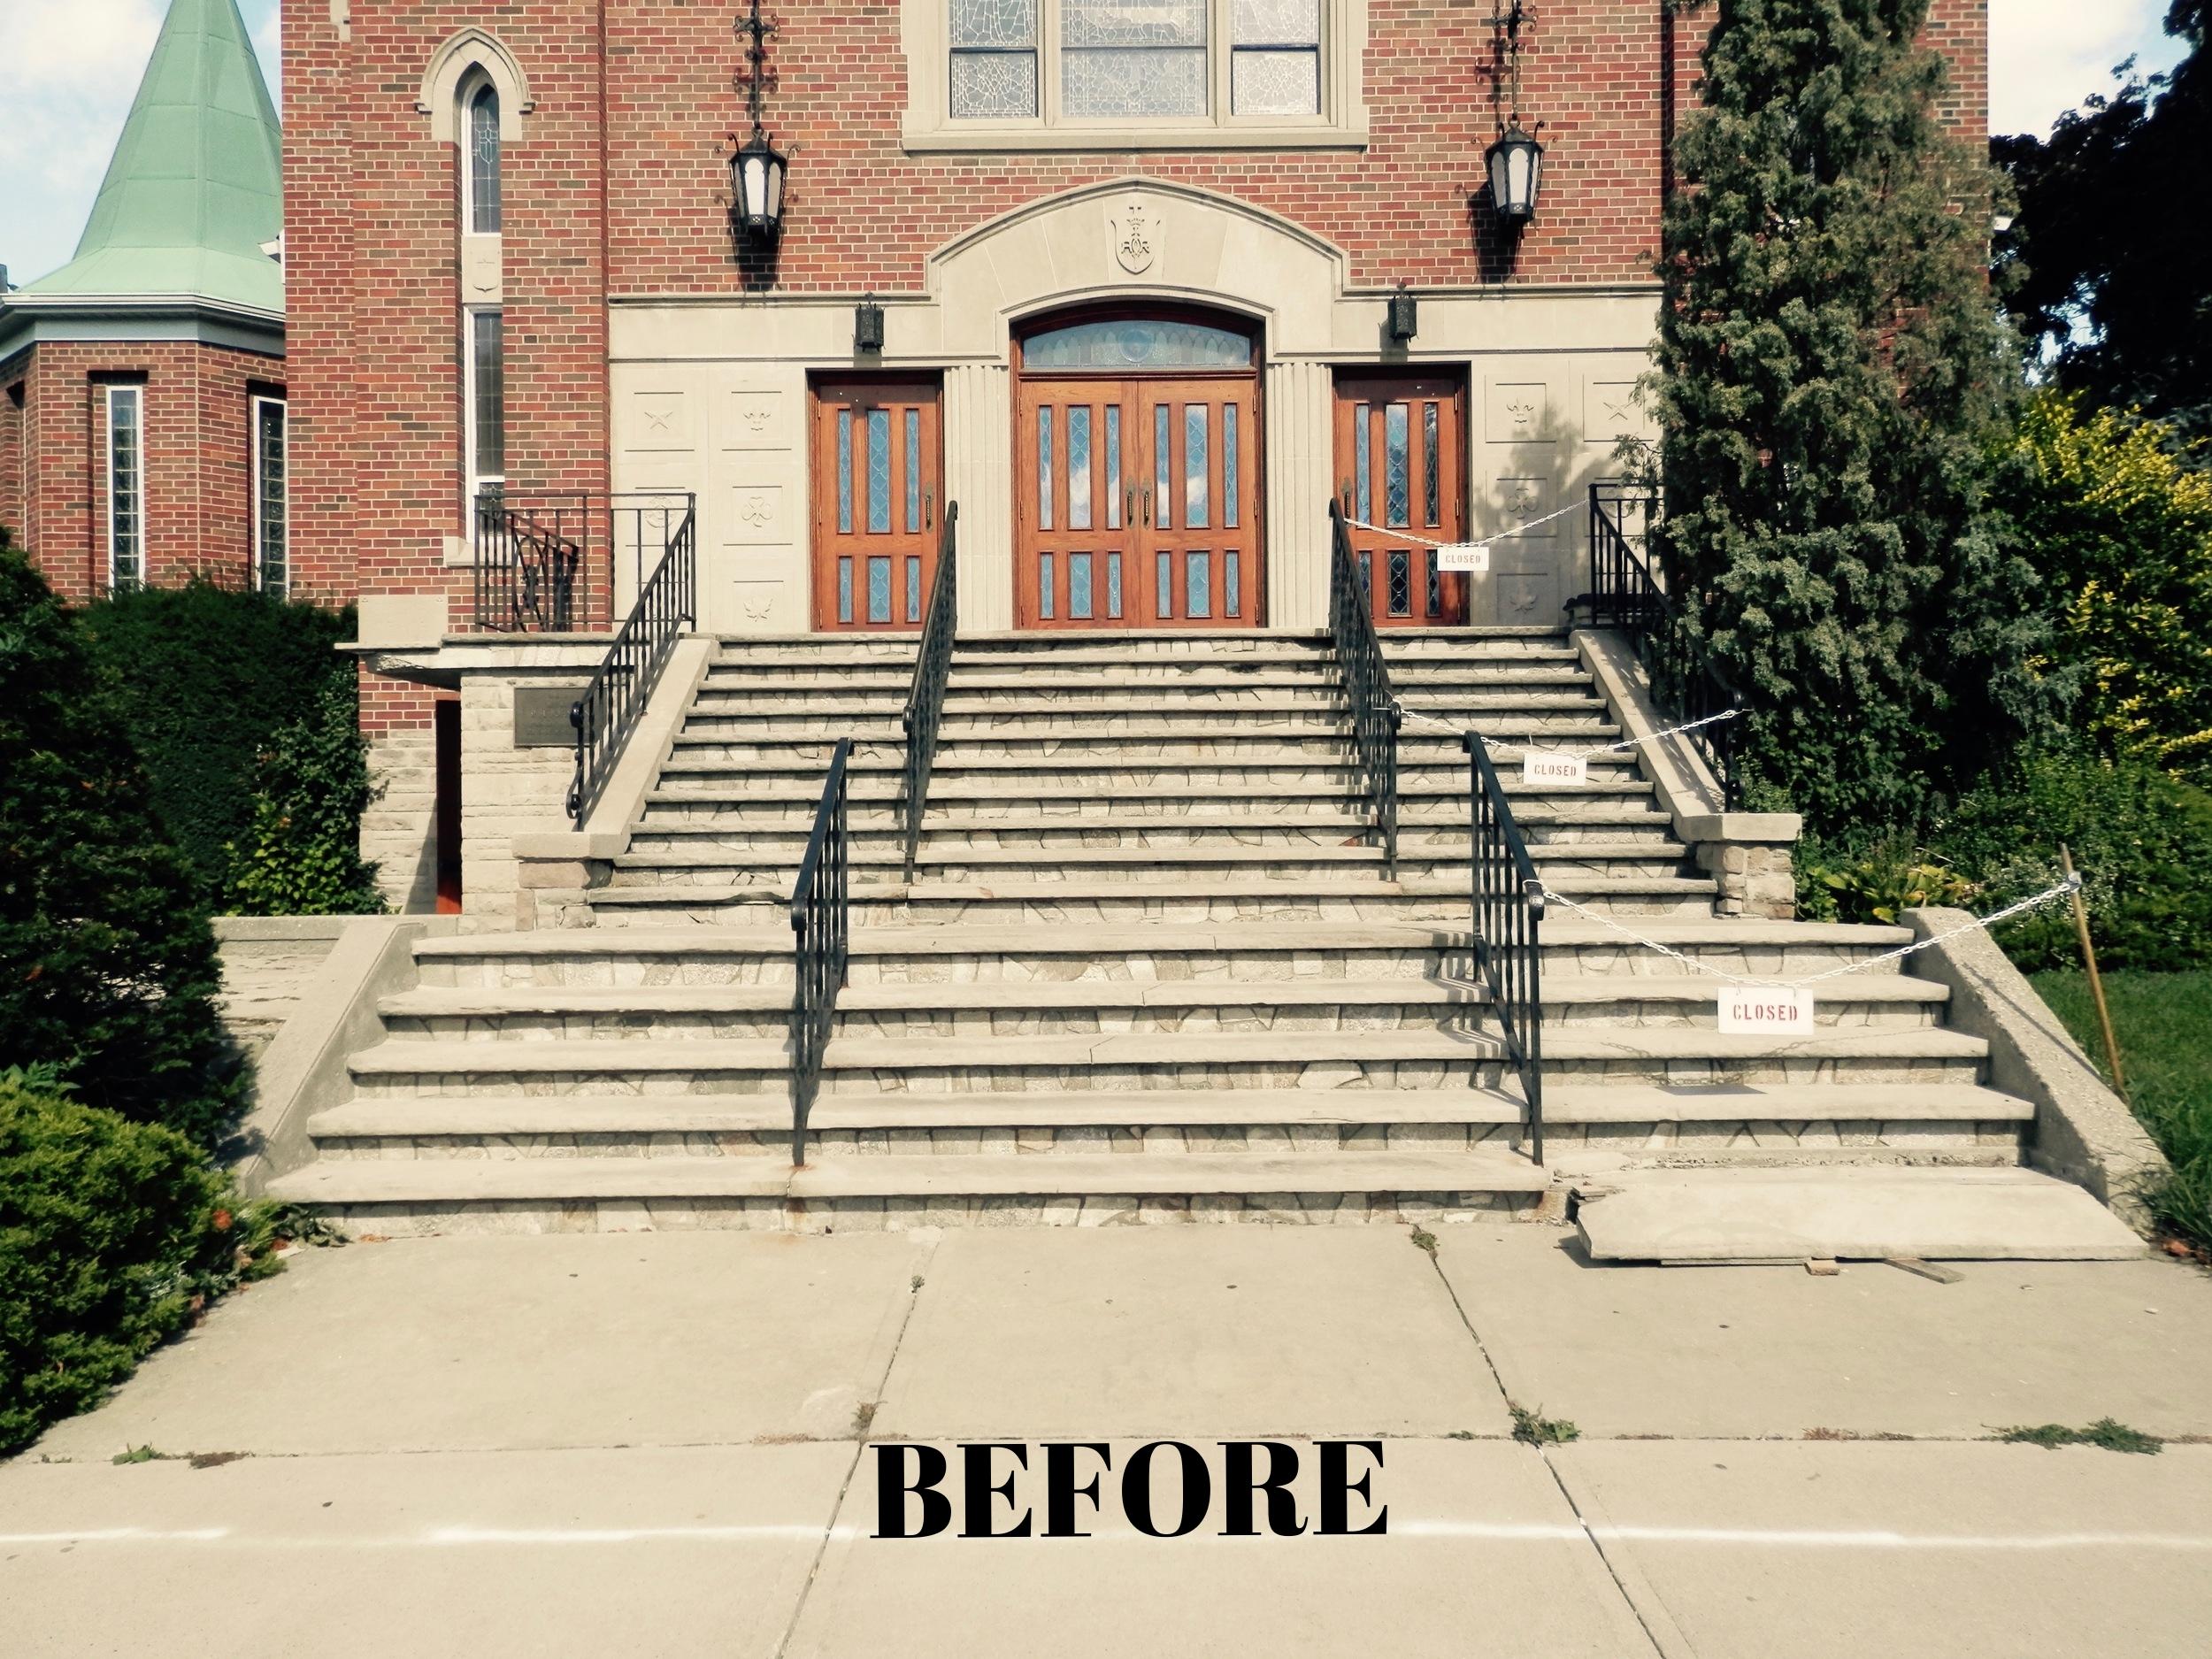 #6-Church-Before (1).jpg